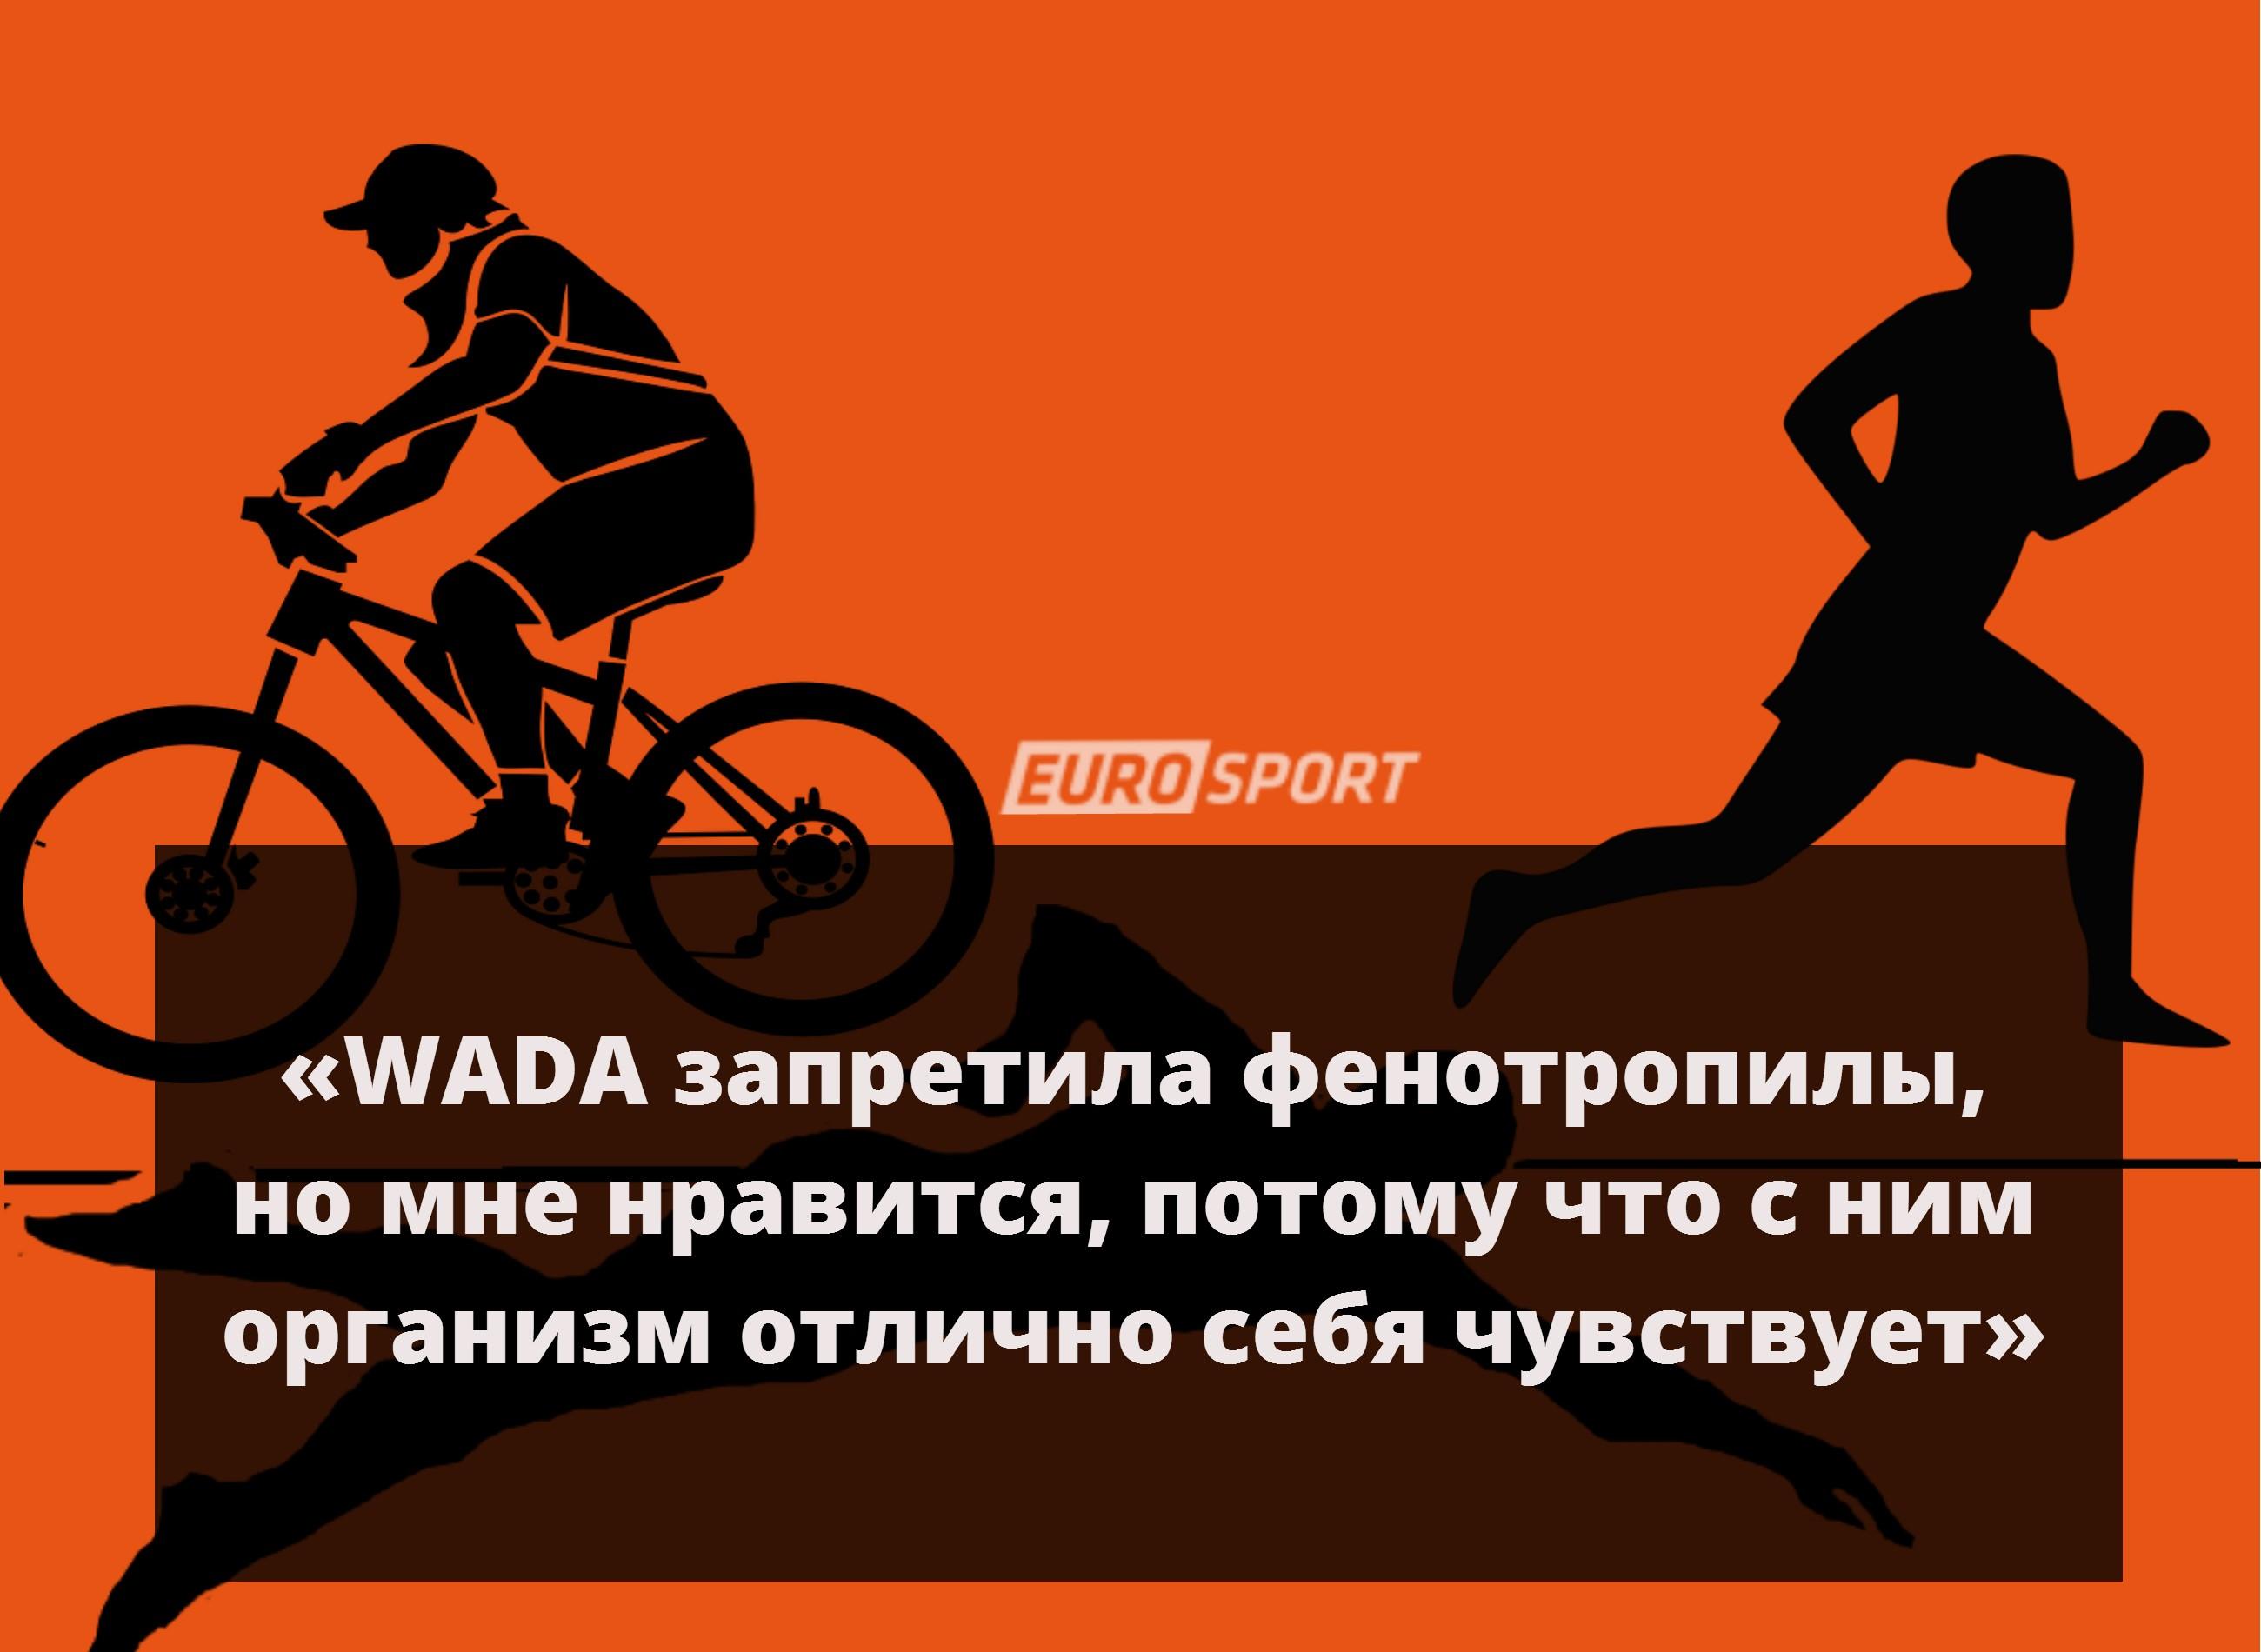 https://i.eurosport.com/2015/05/22/1567548.jpg